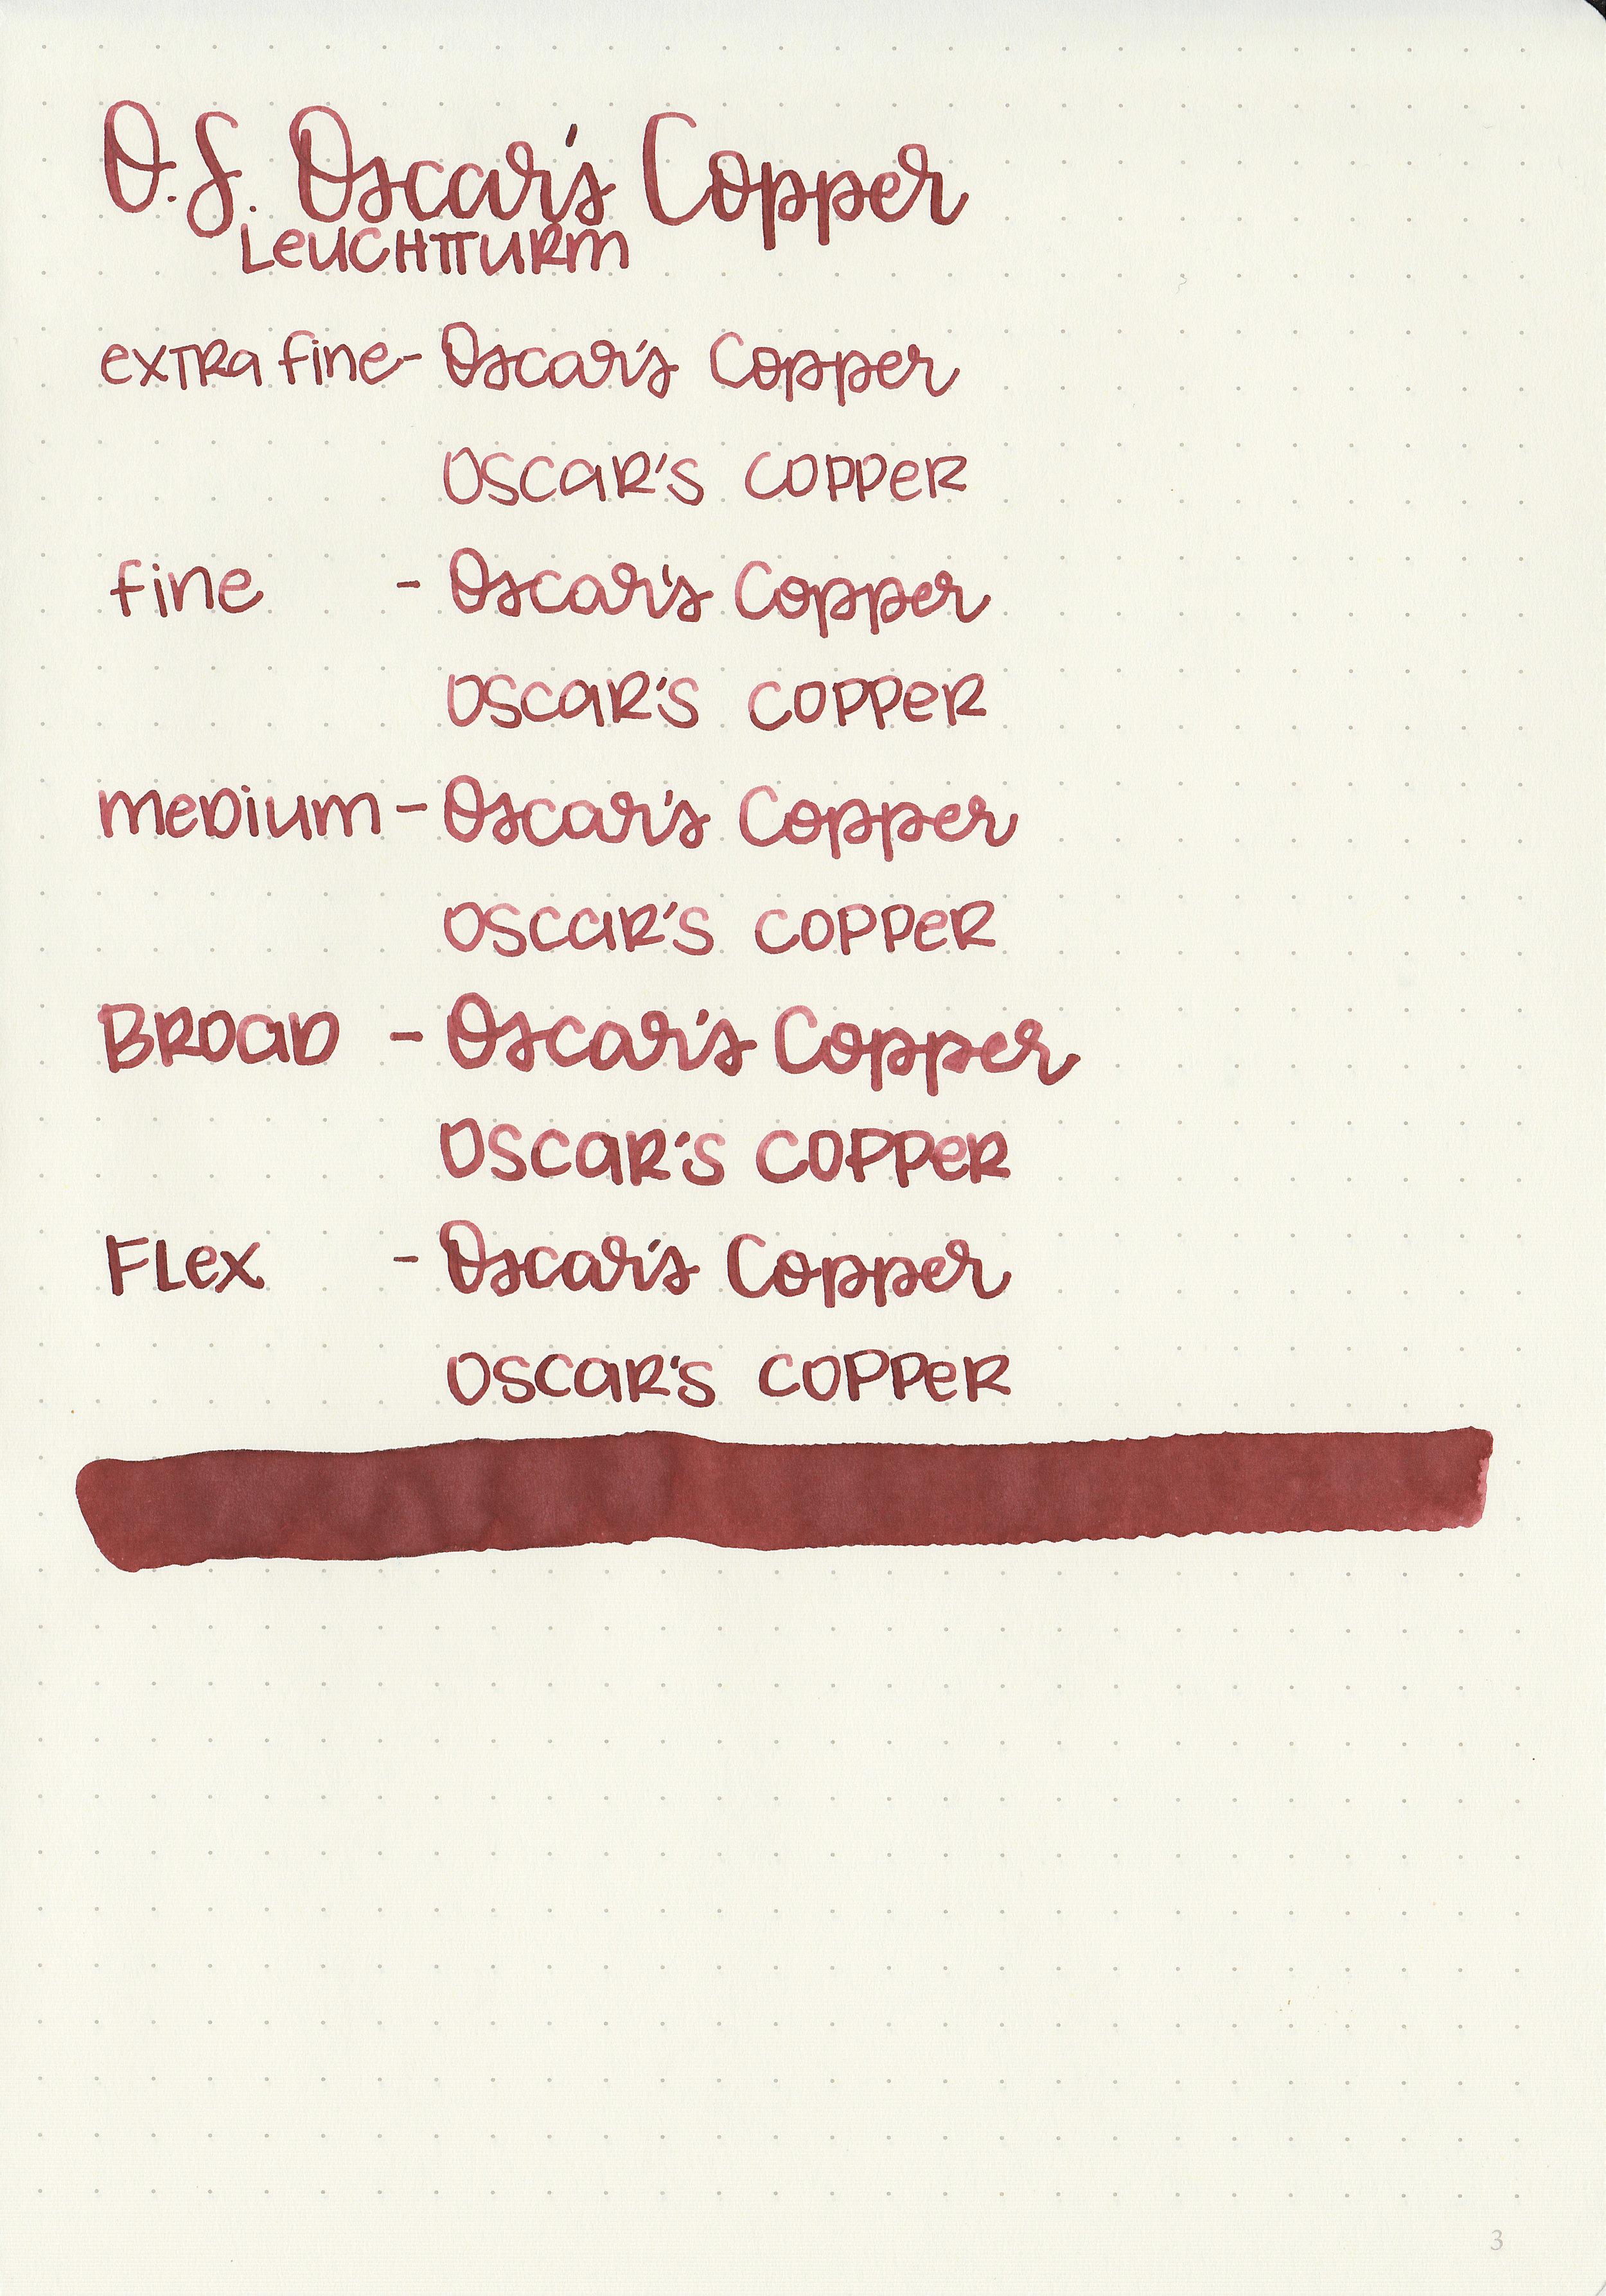 os-oscars-copper-9.jpg